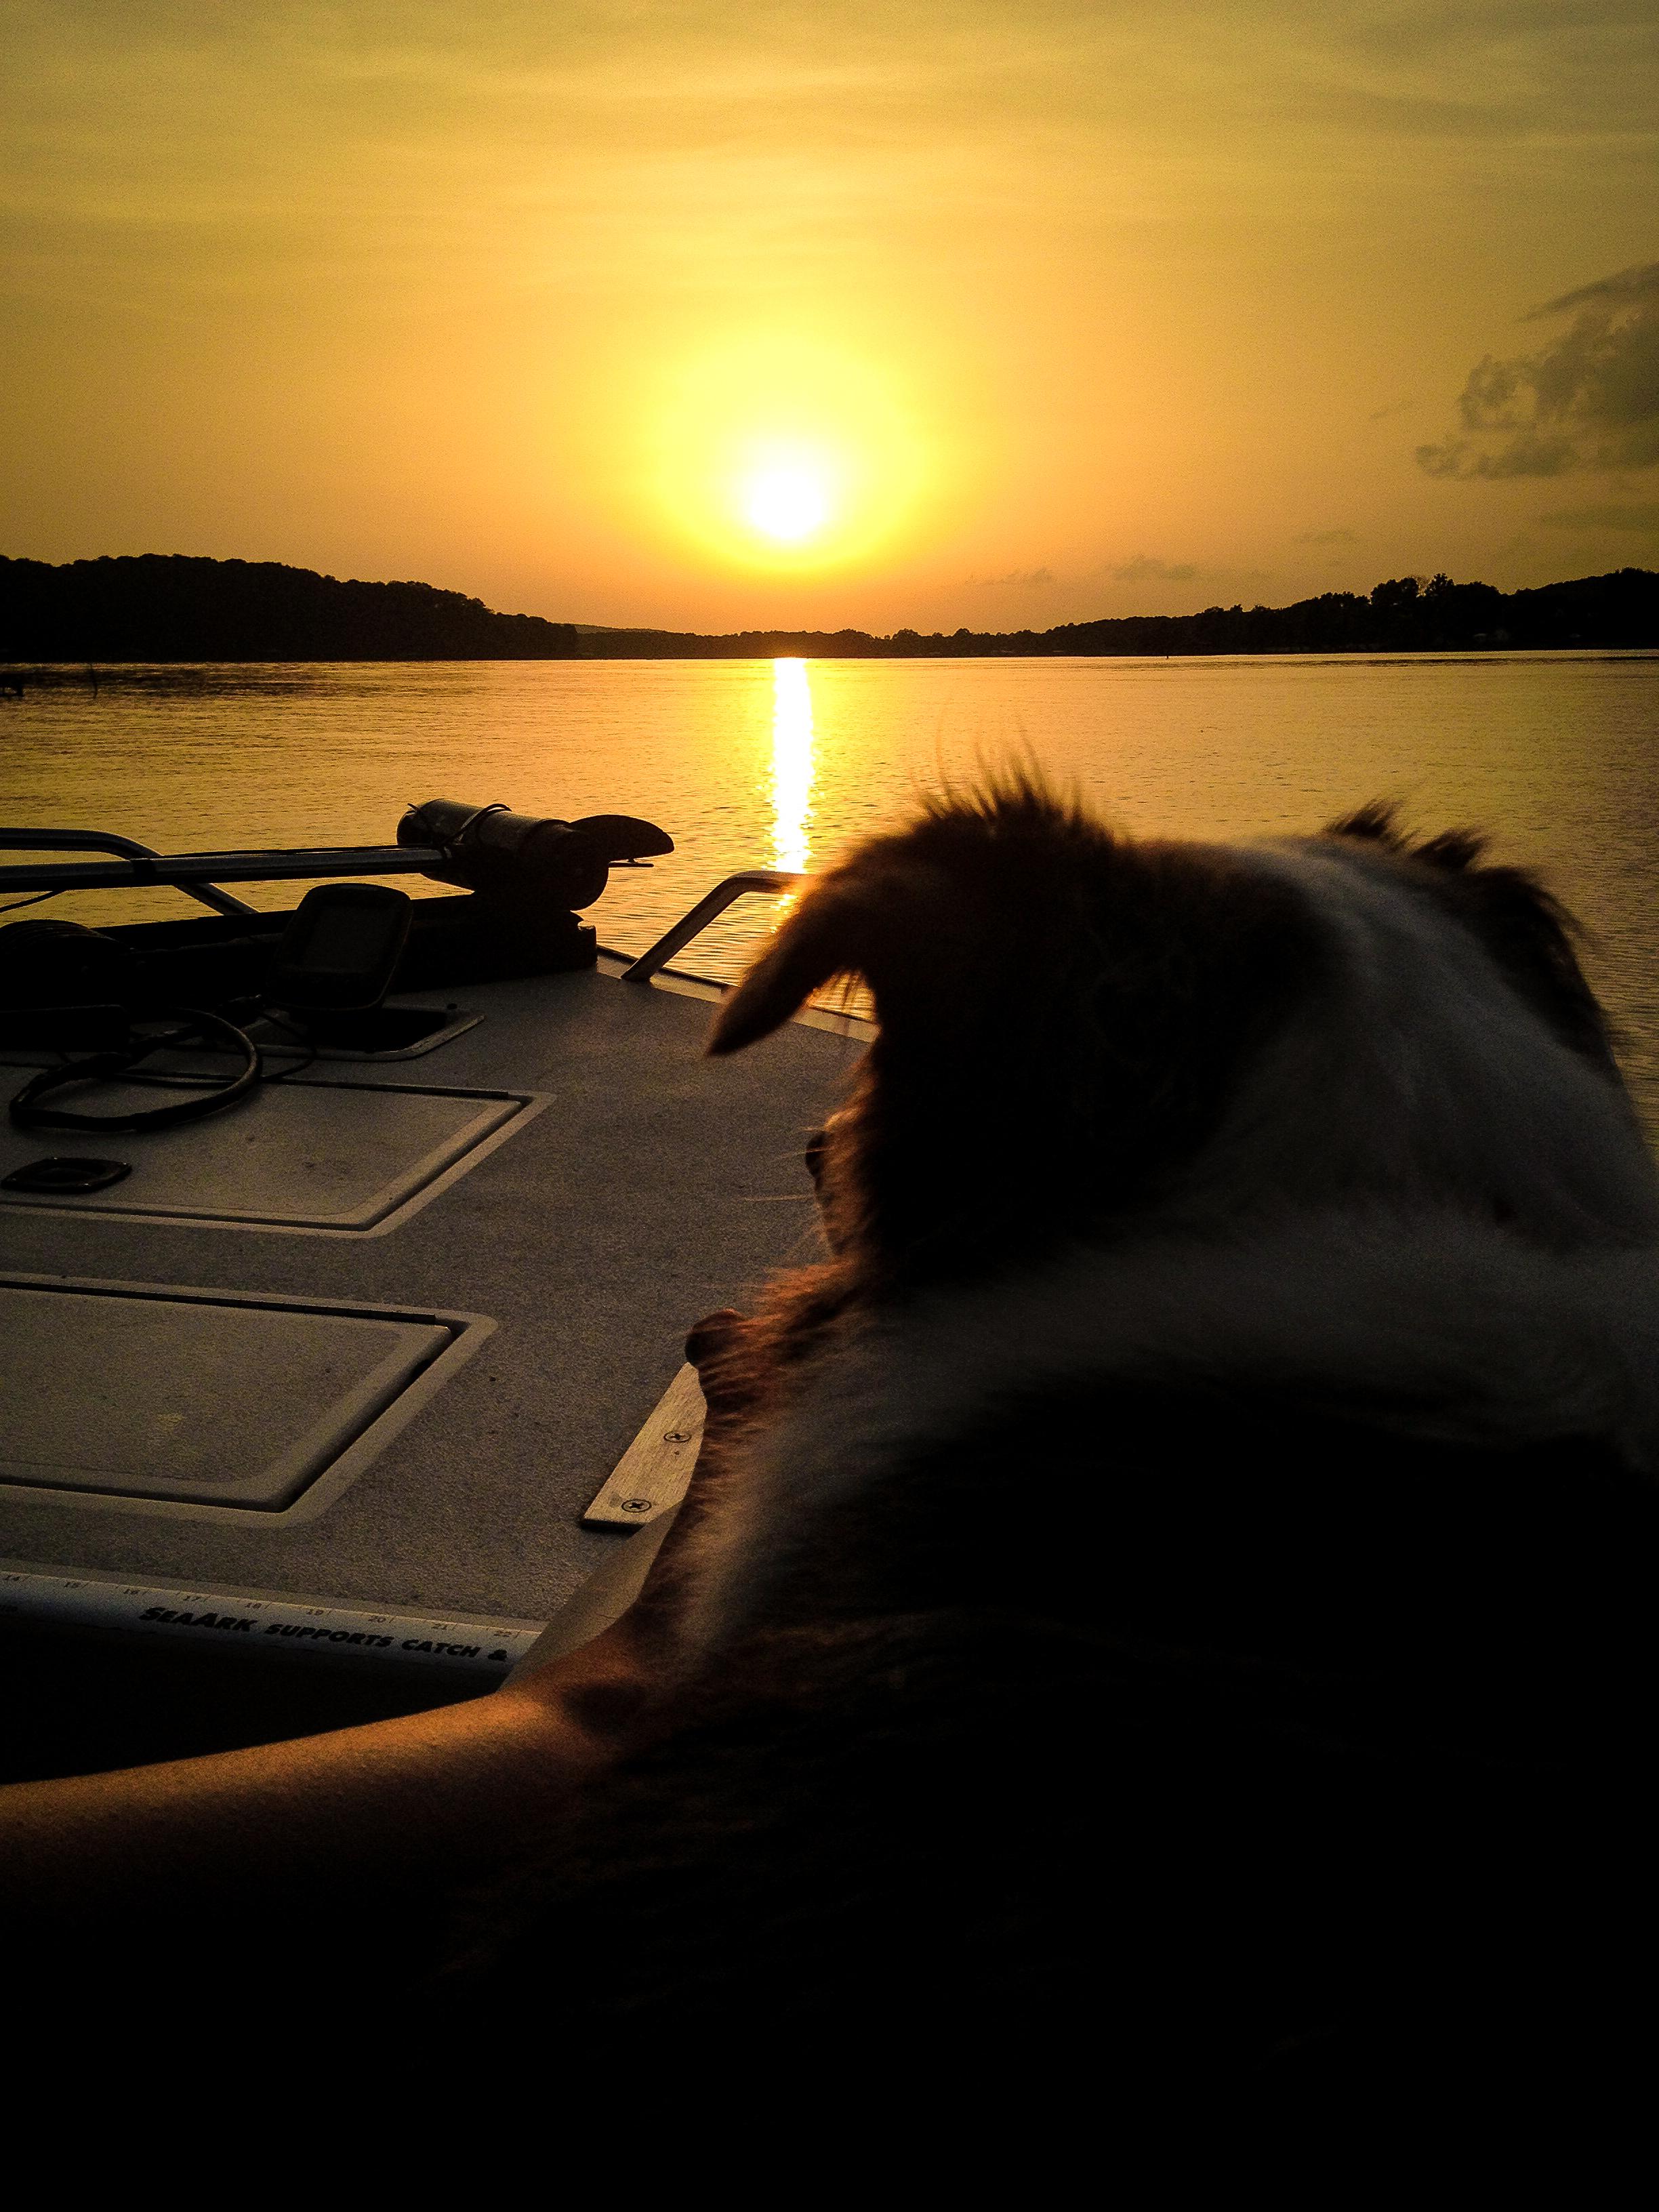 Eveinging boat ride-1.jpg